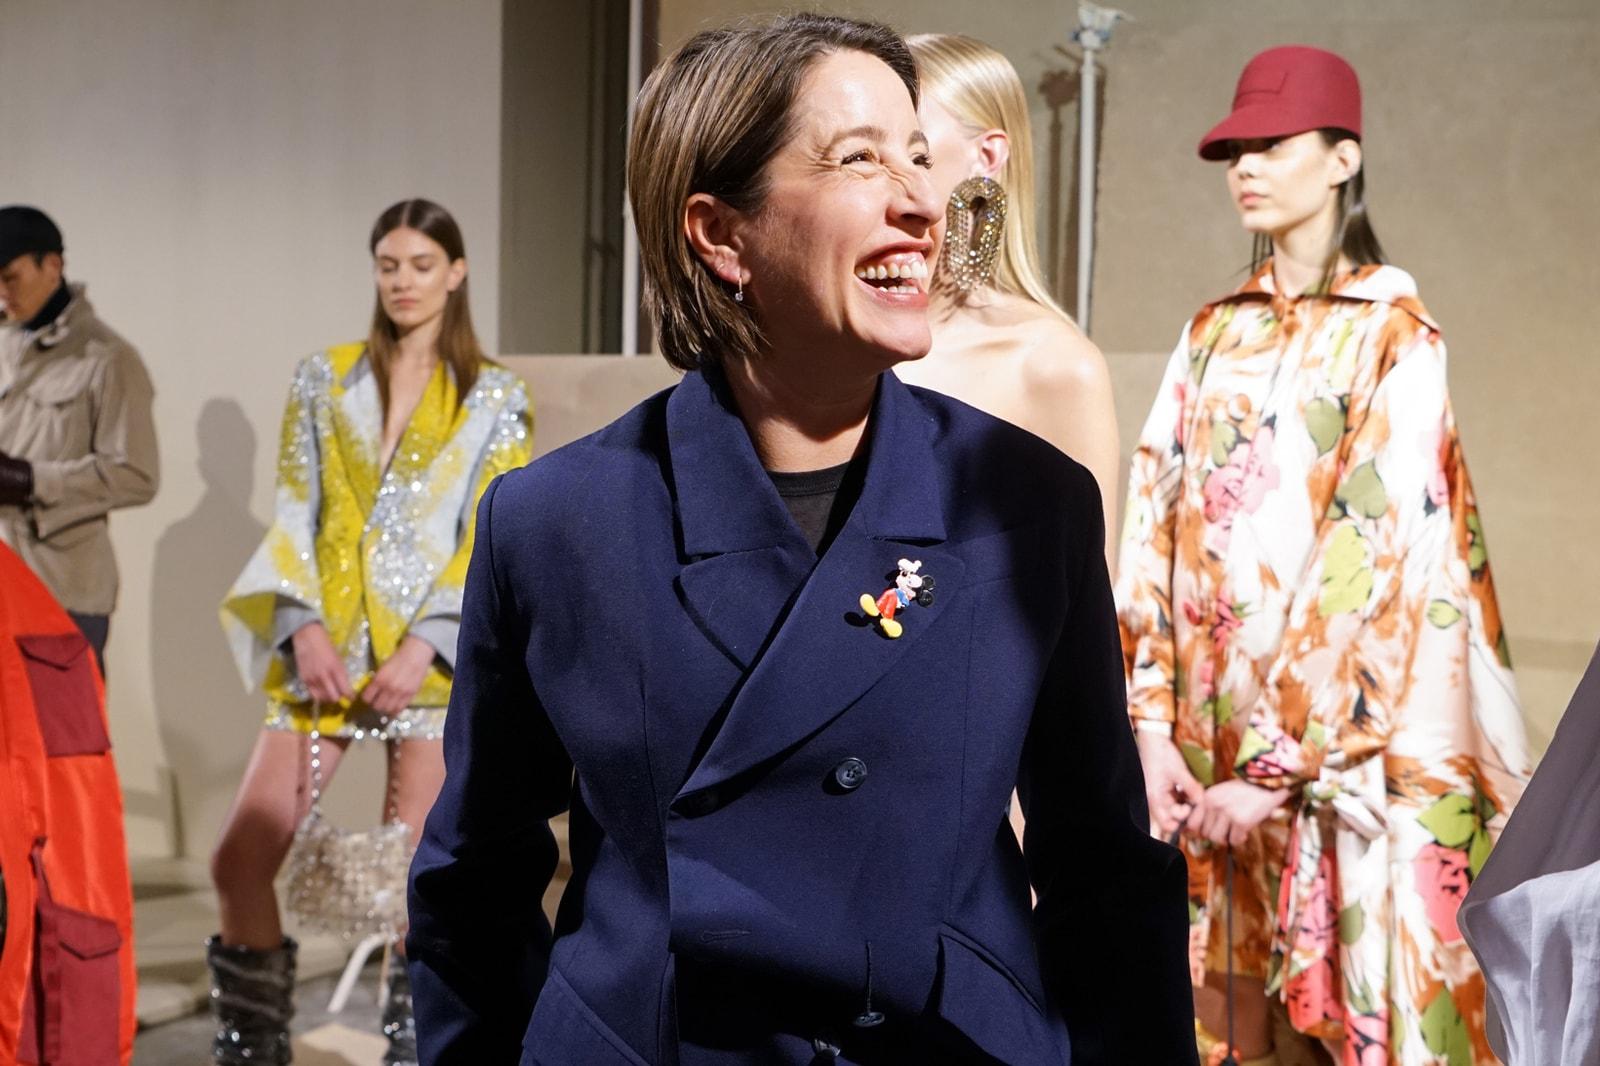 Natalie Kingham MATCHEFASHION Fashion Buying Director